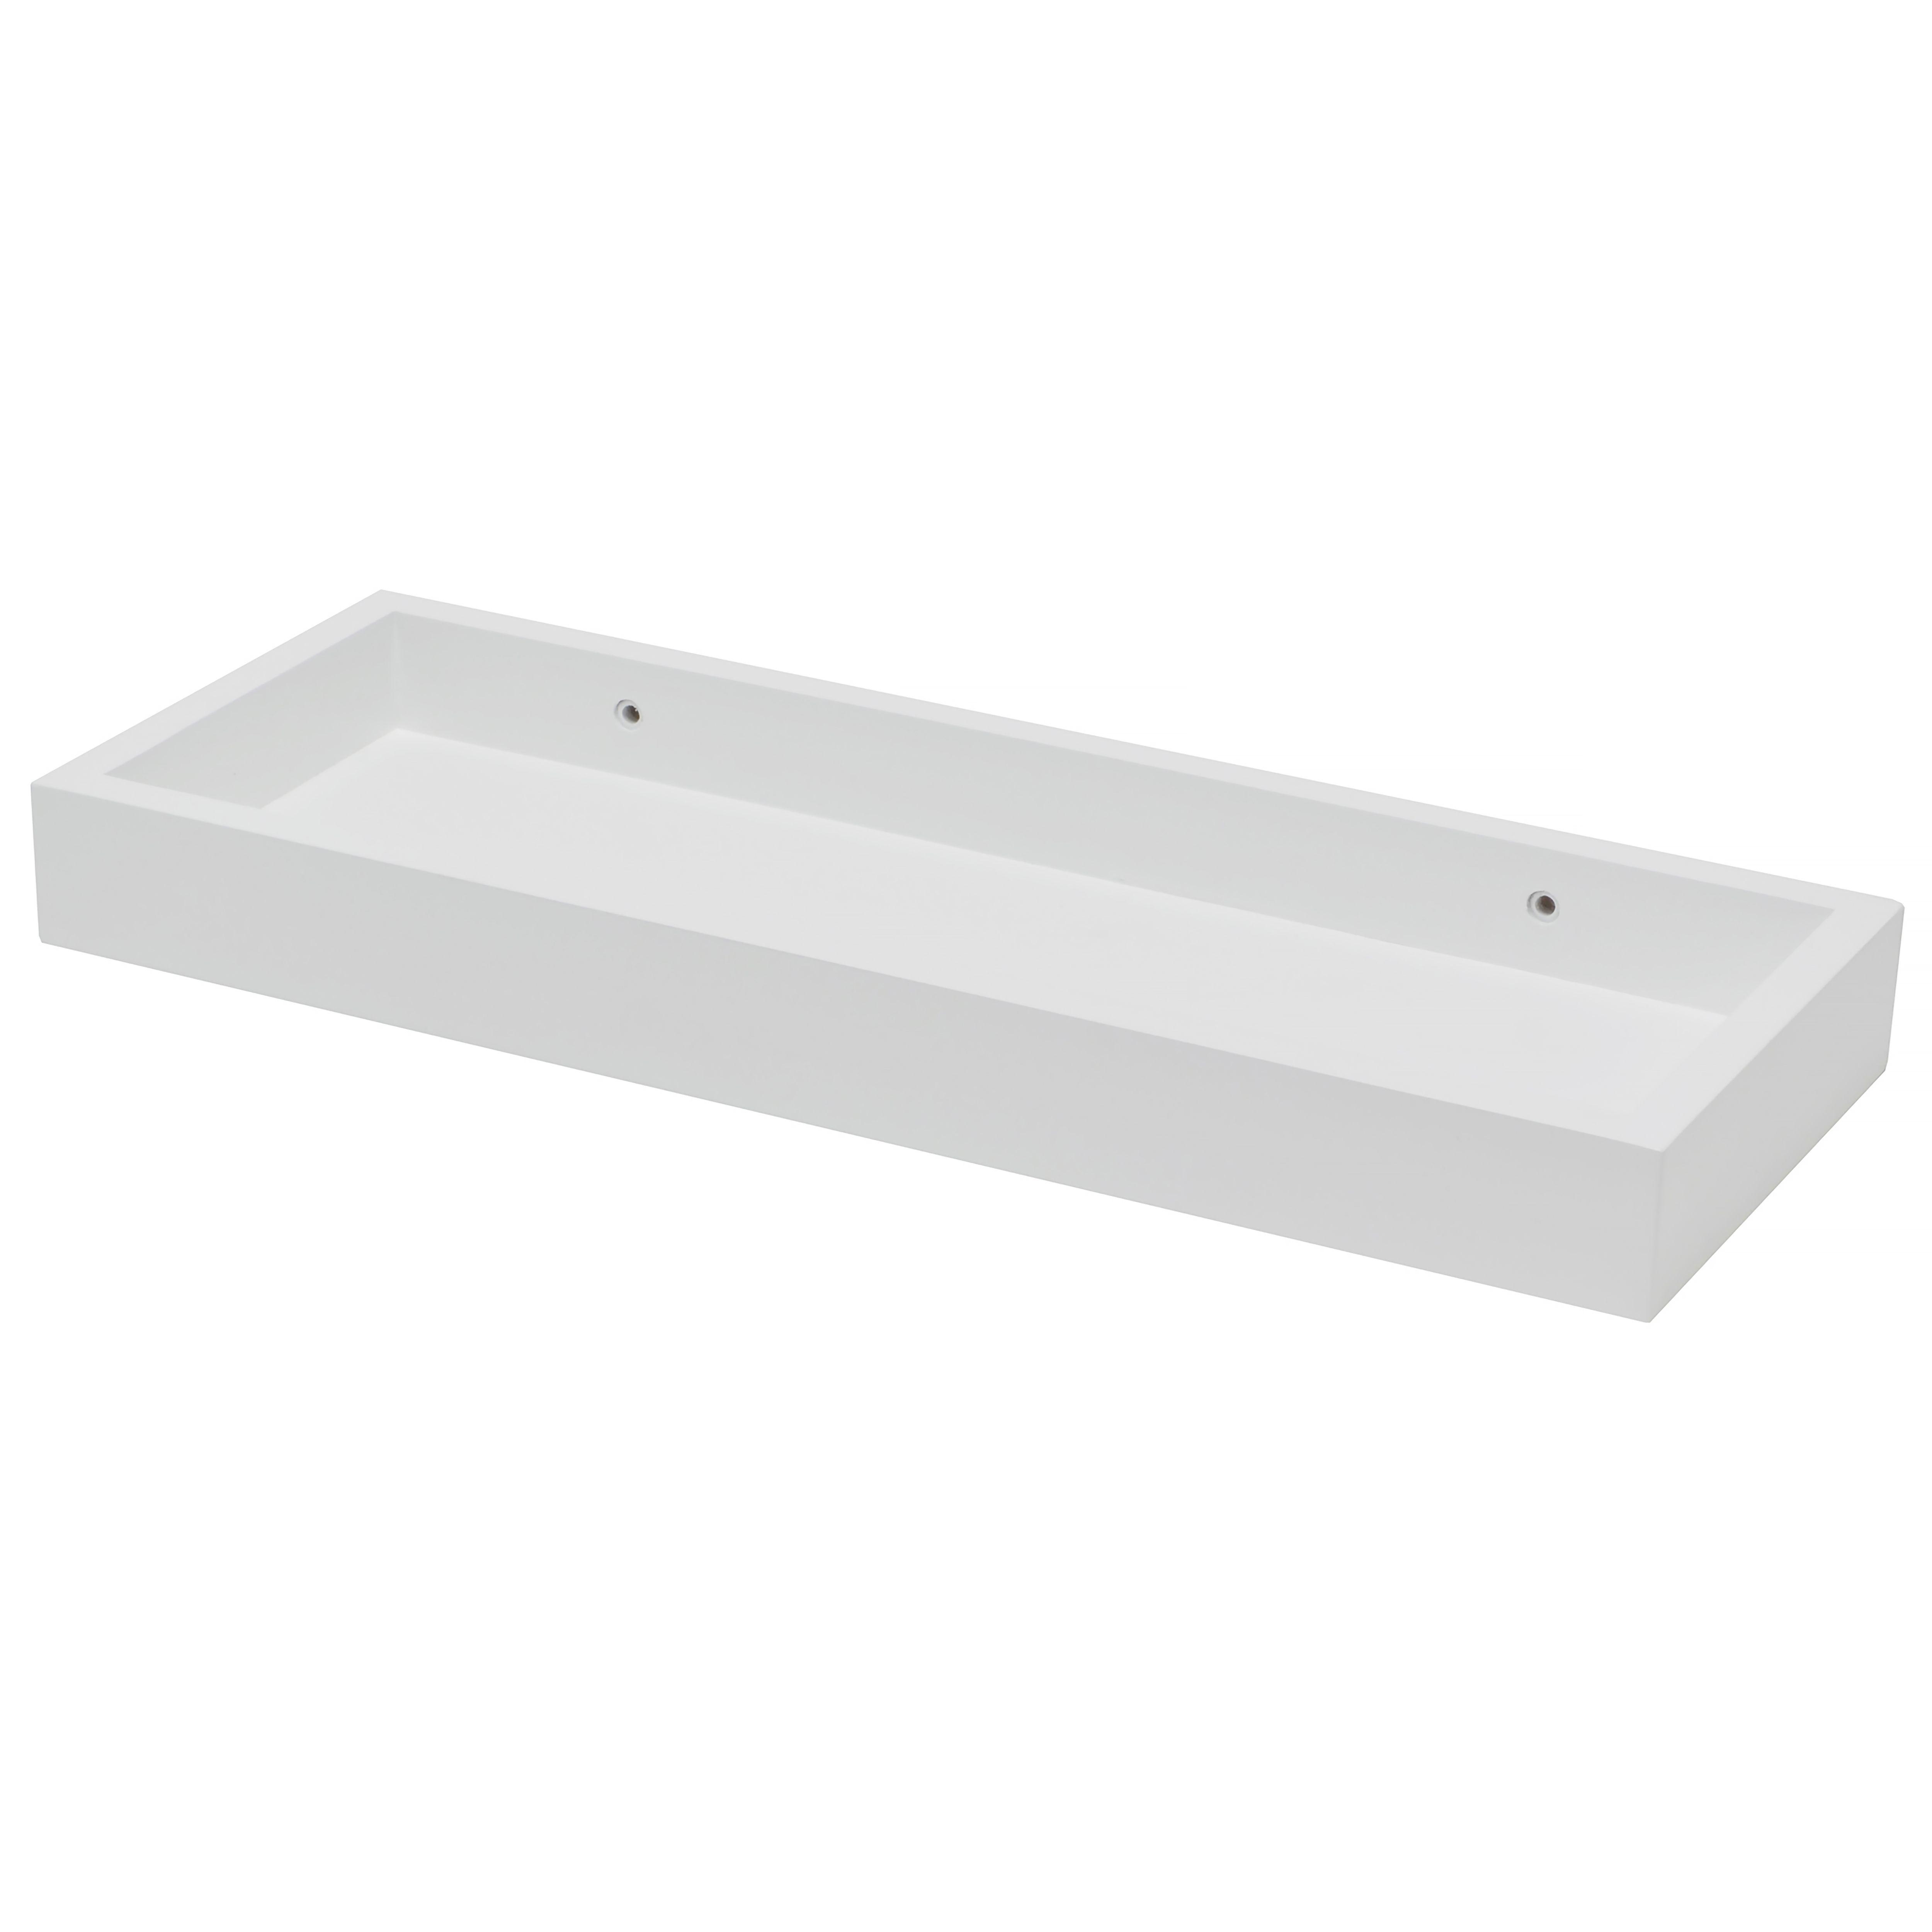 white matt storage shelf l 401mm d 150mm departments. Black Bedroom Furniture Sets. Home Design Ideas